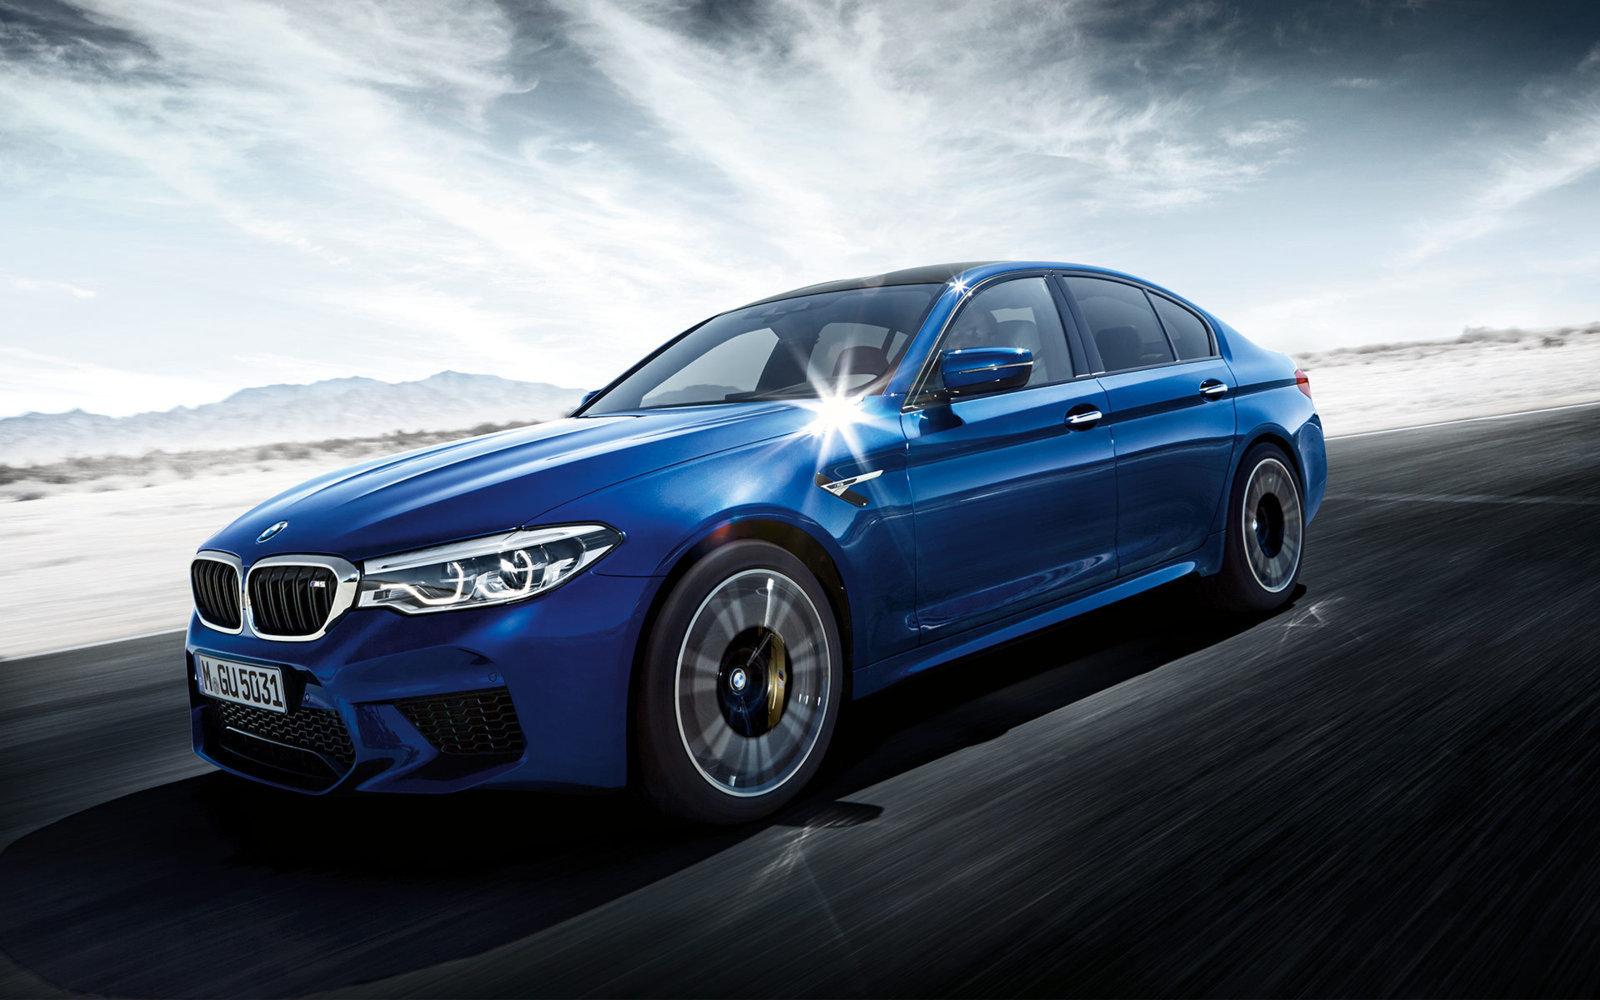 BMW-M5-2018-Wallpaper-5.jpg